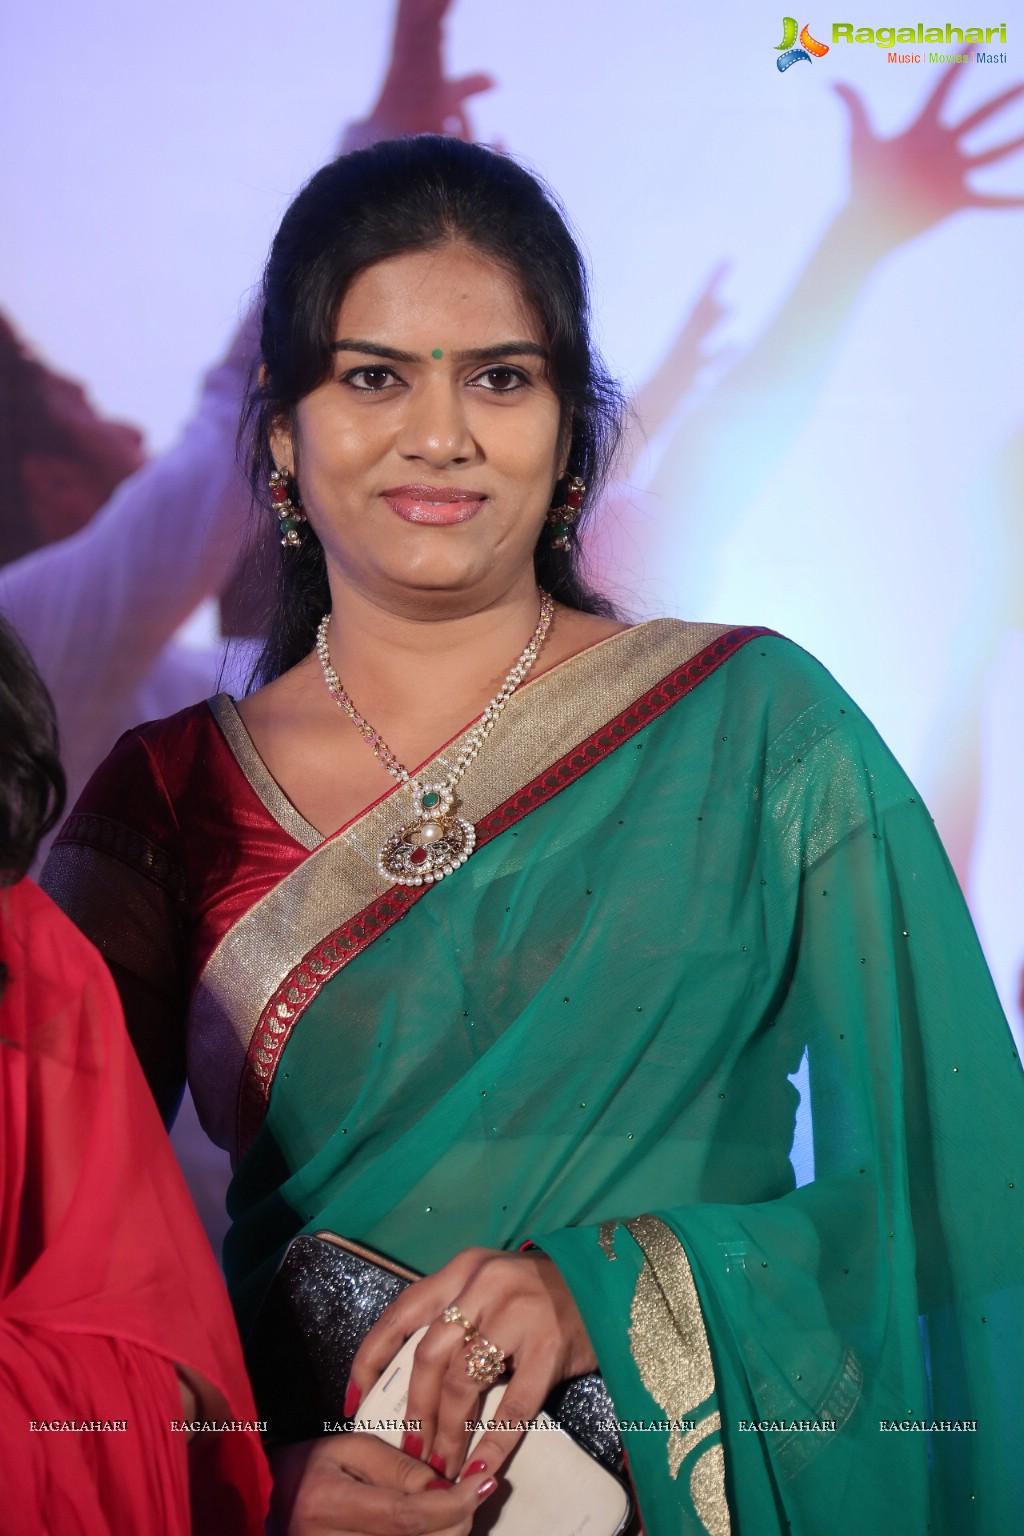 Tamil Aunty Photos Beautiful Desi Indian Malu Girls -7177